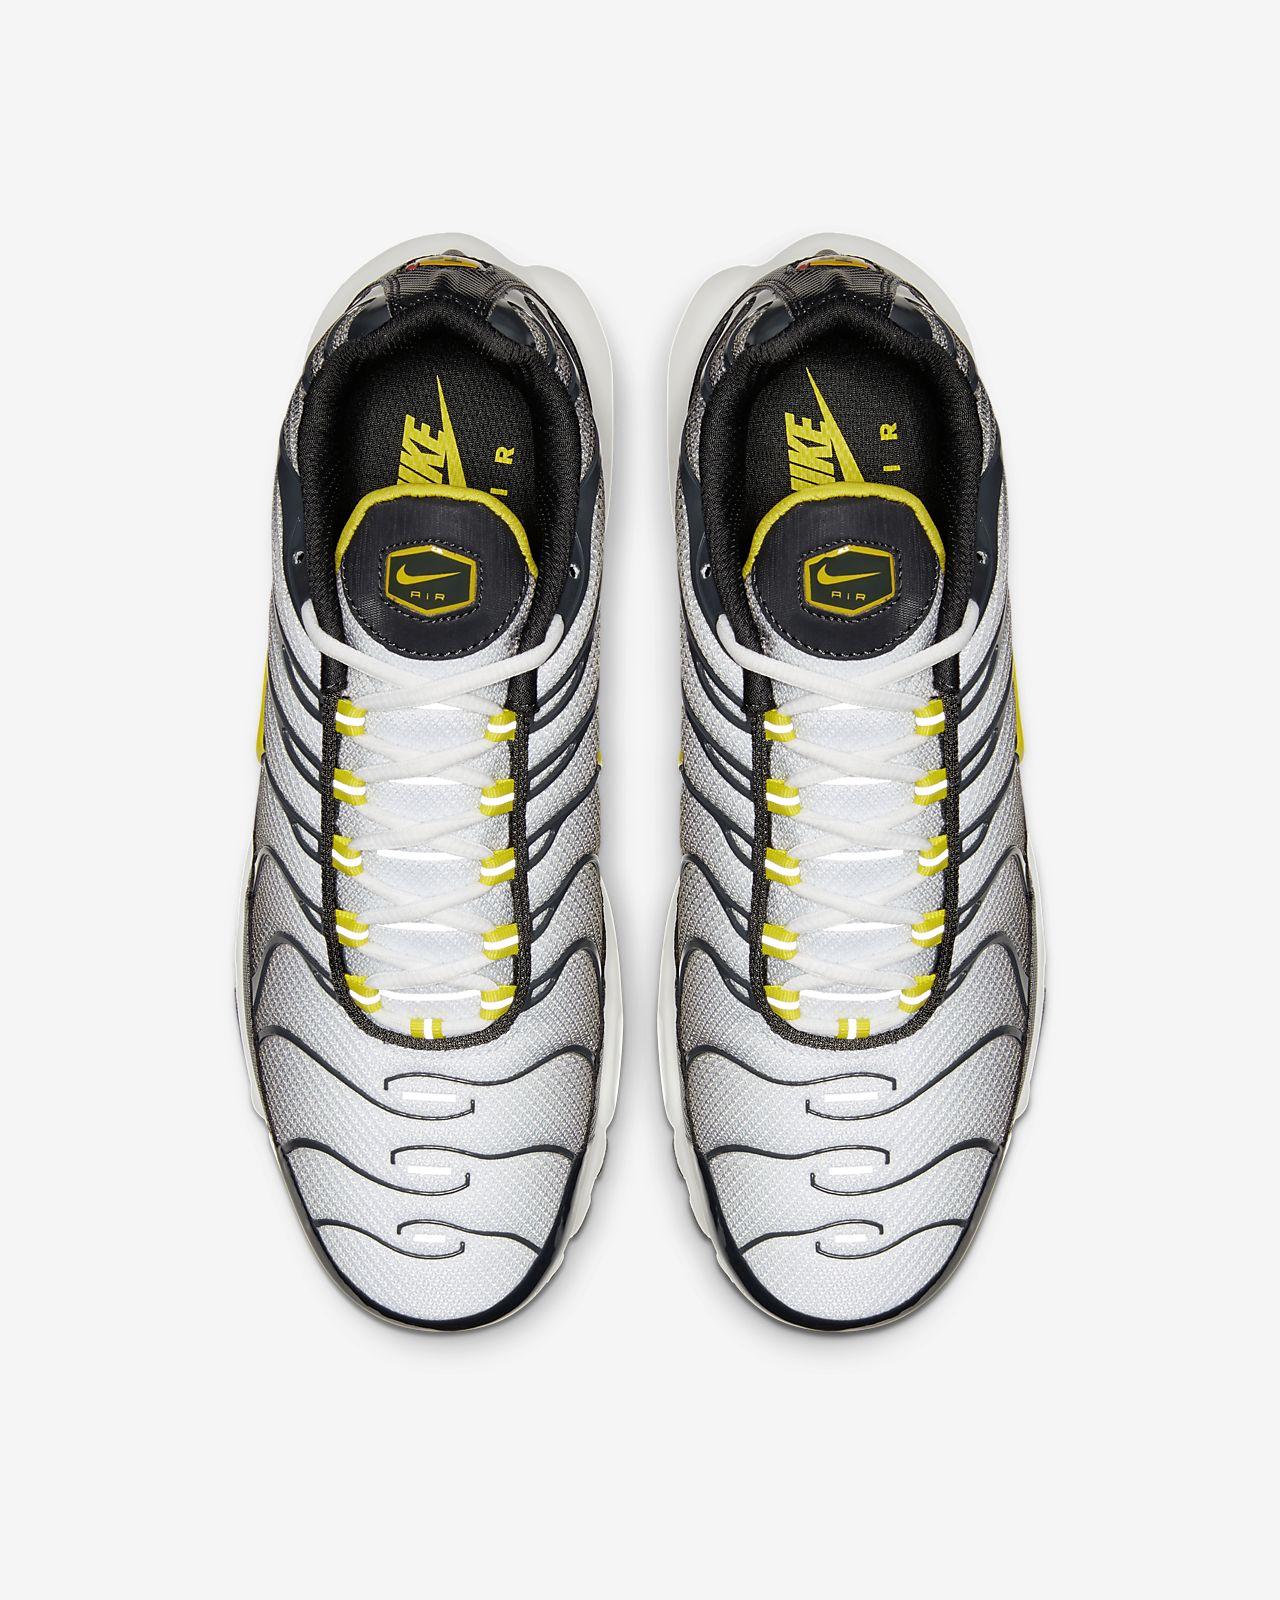 Nike Air Max Plus Black Grey CI2299 001 For Sale